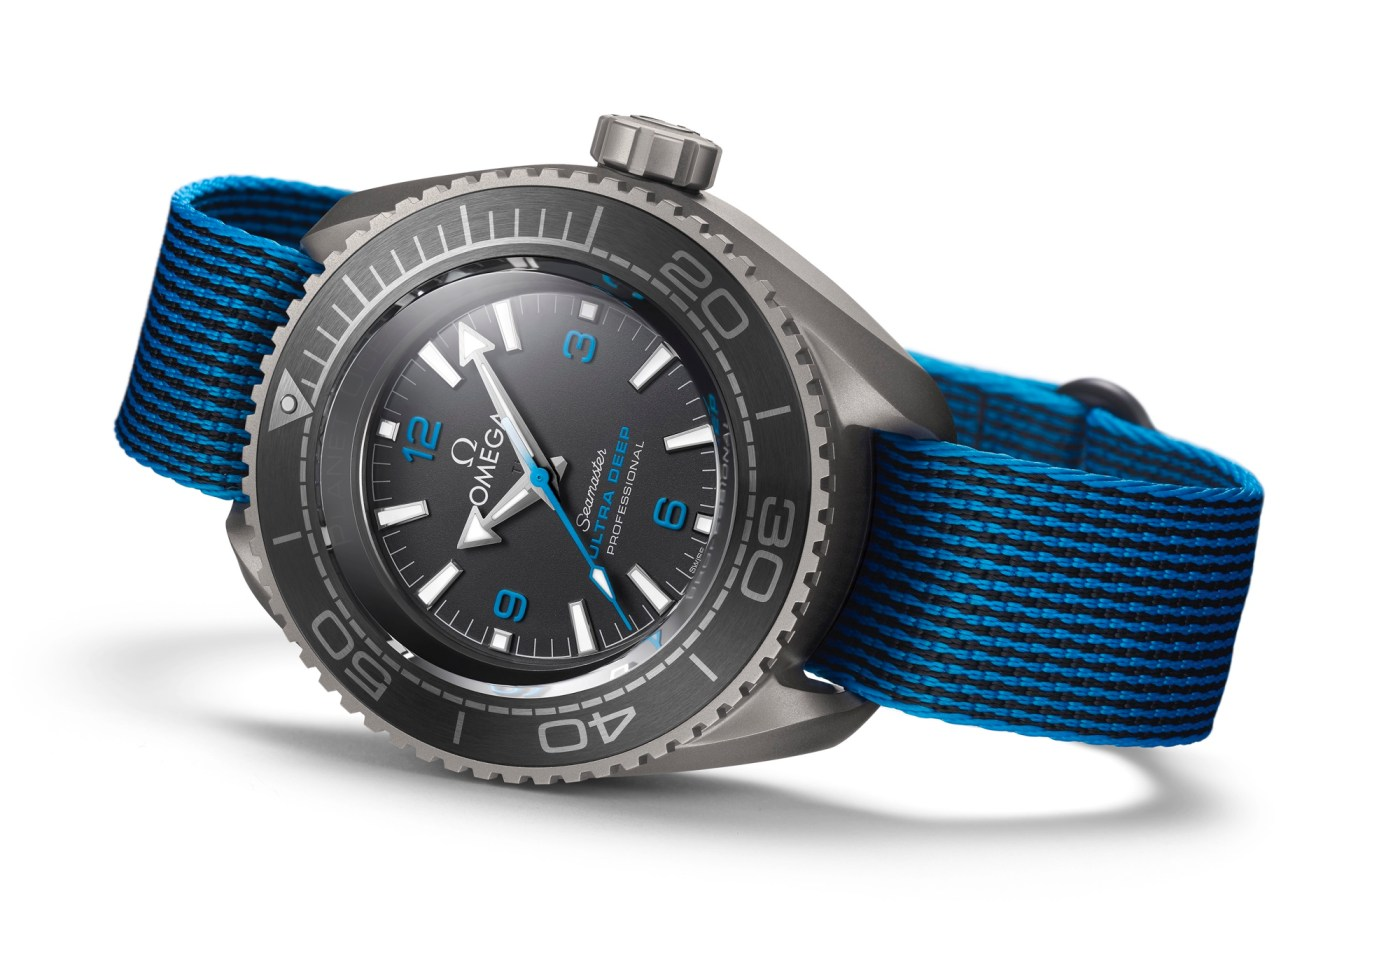 Omega Seamaster Ultra Deep Professional dive watch